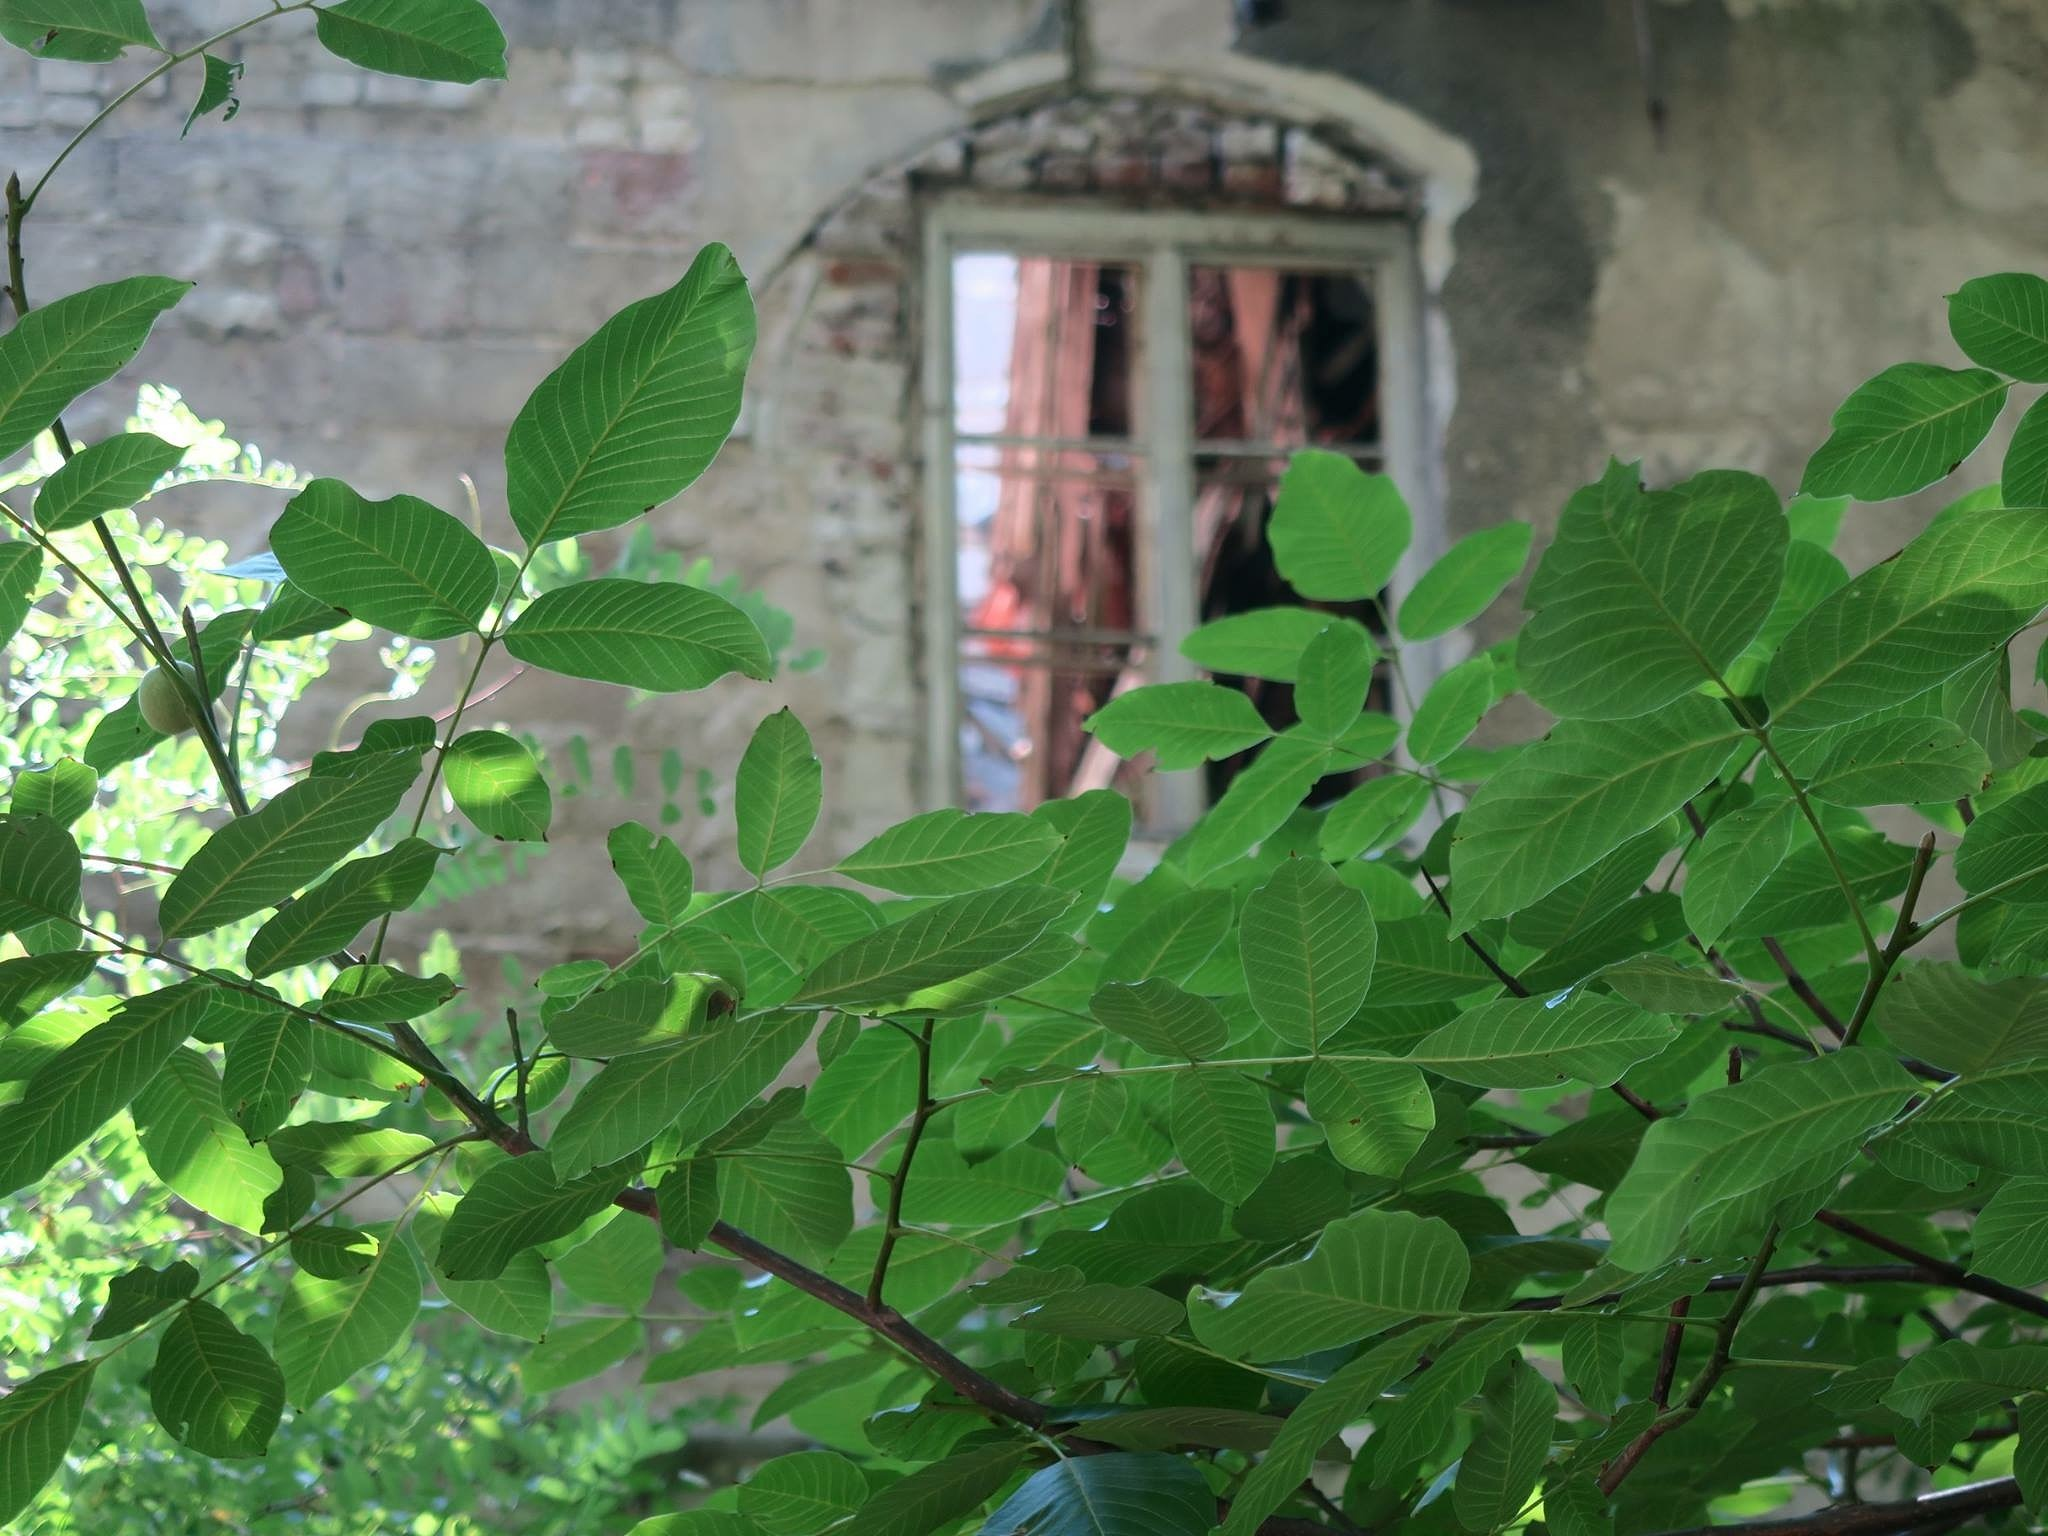 Lonely home by Bistra Belcheva